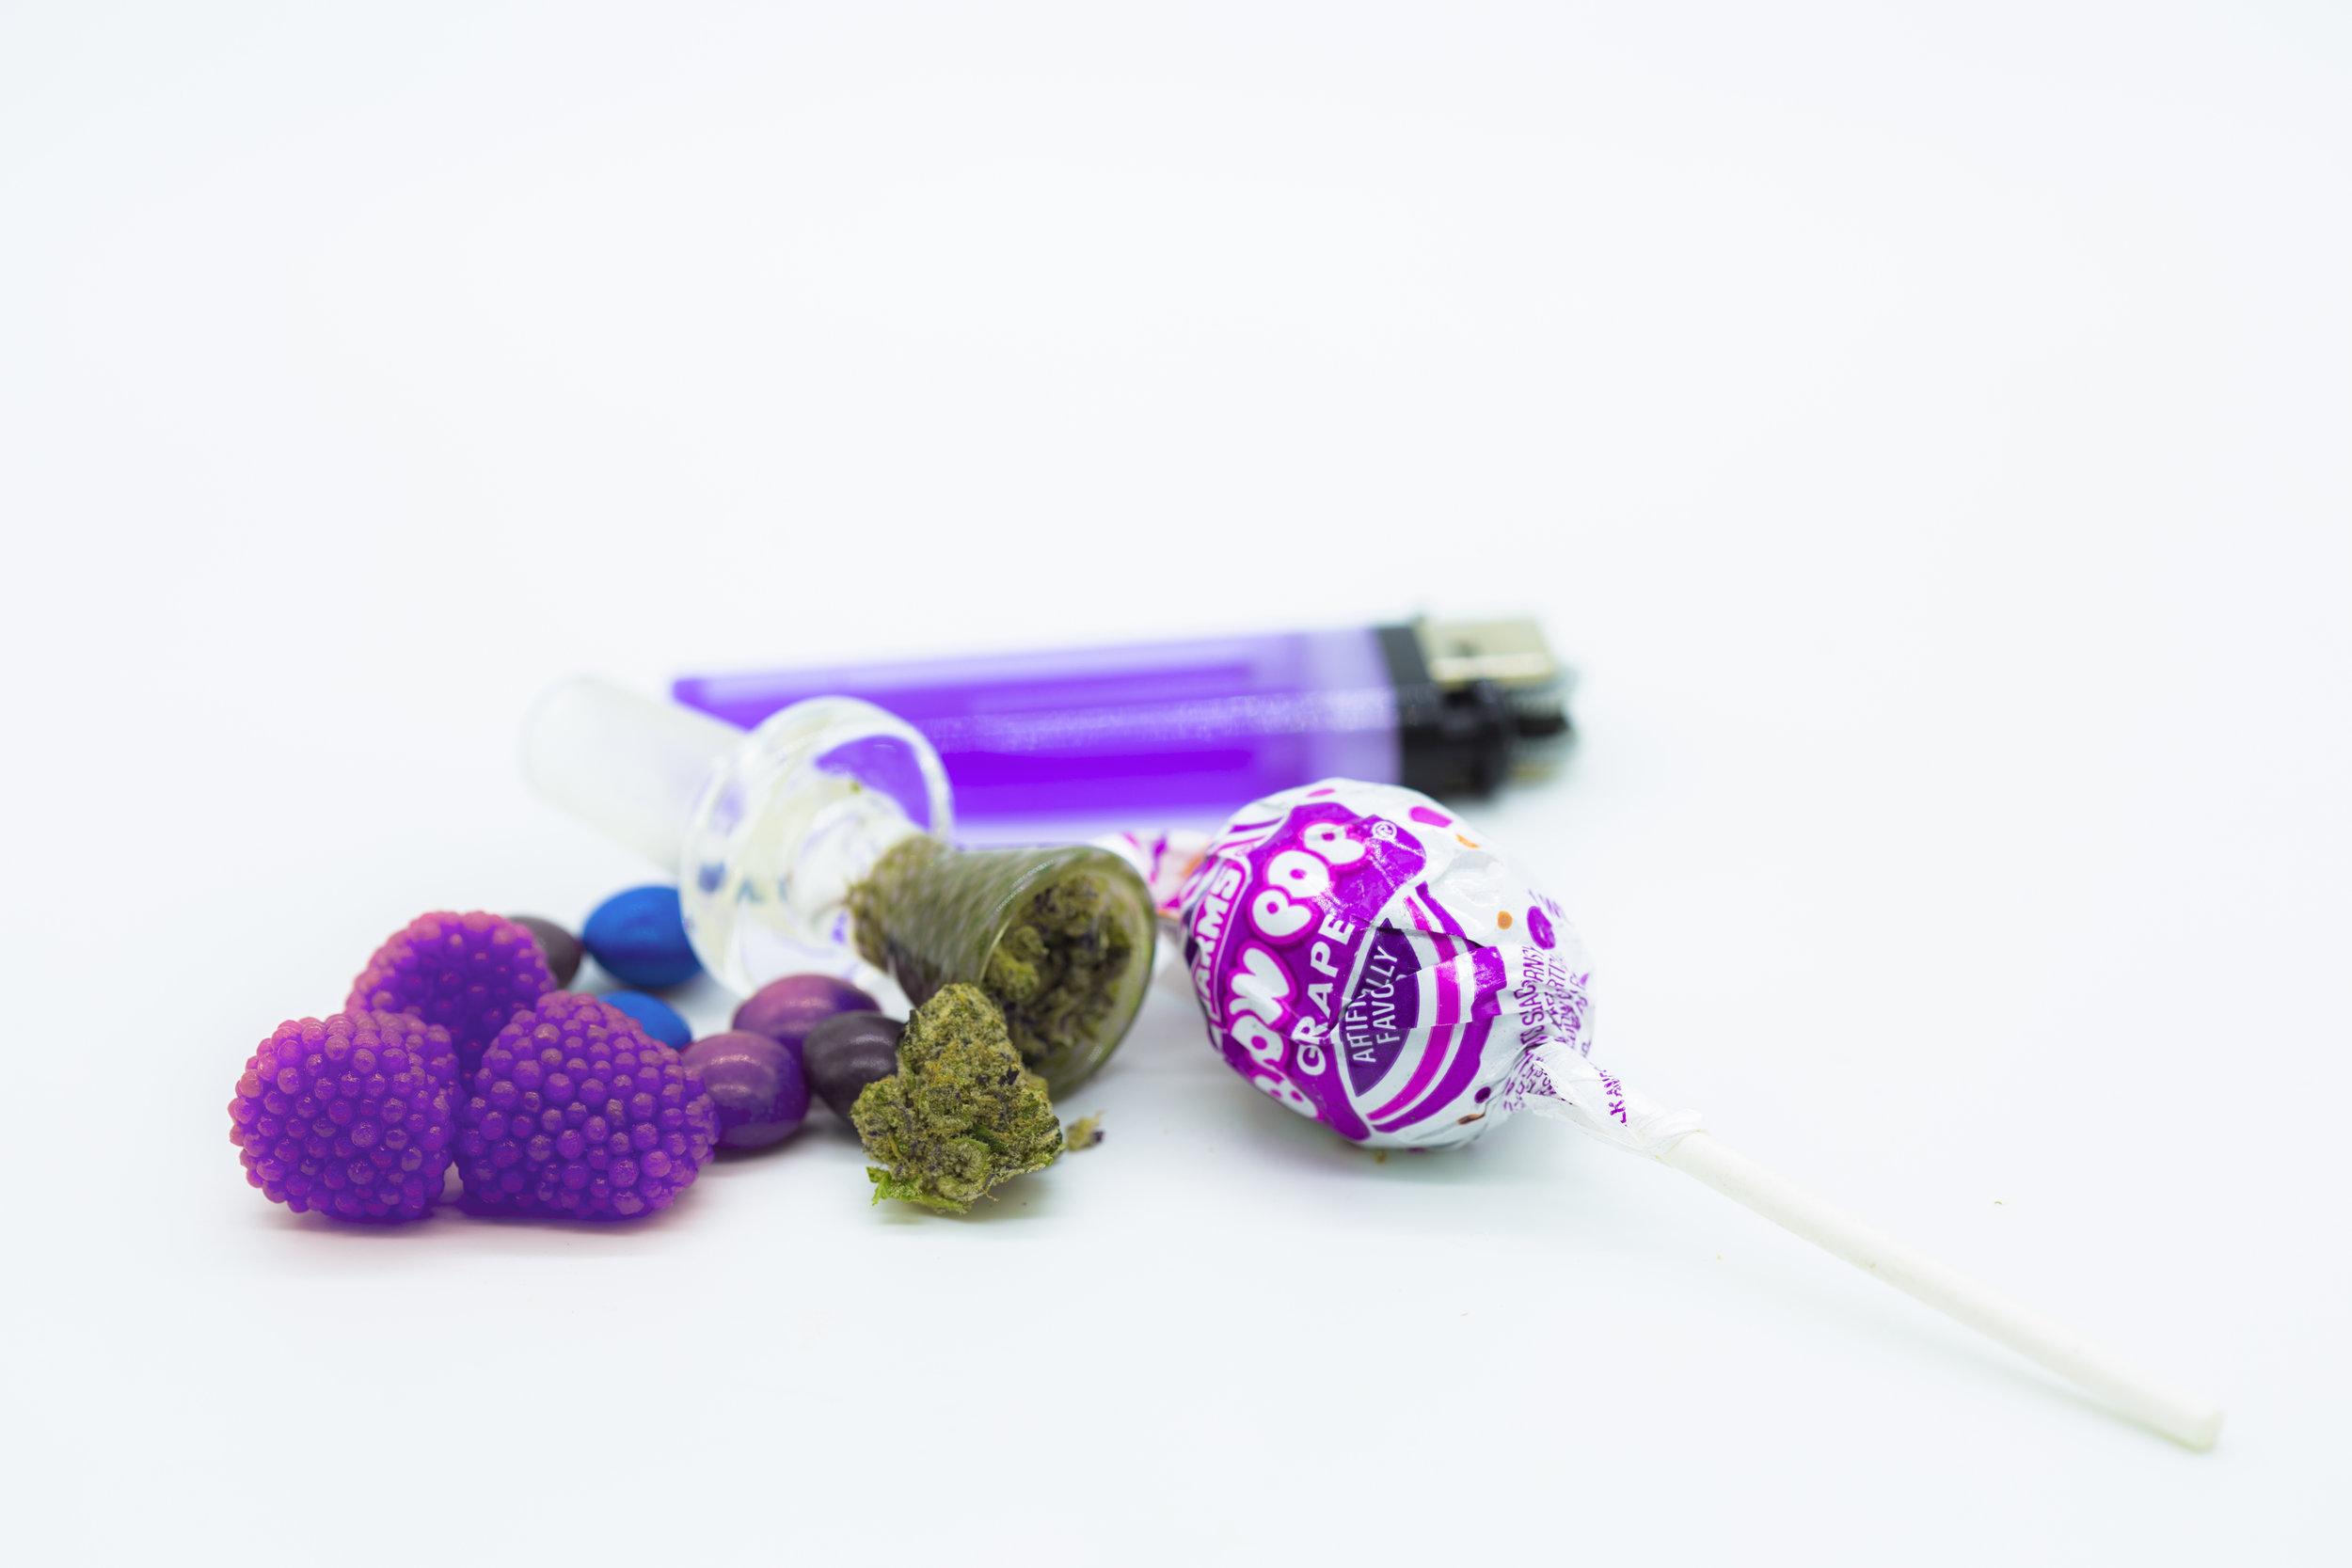 purplepunchcompressedfinal.jpg